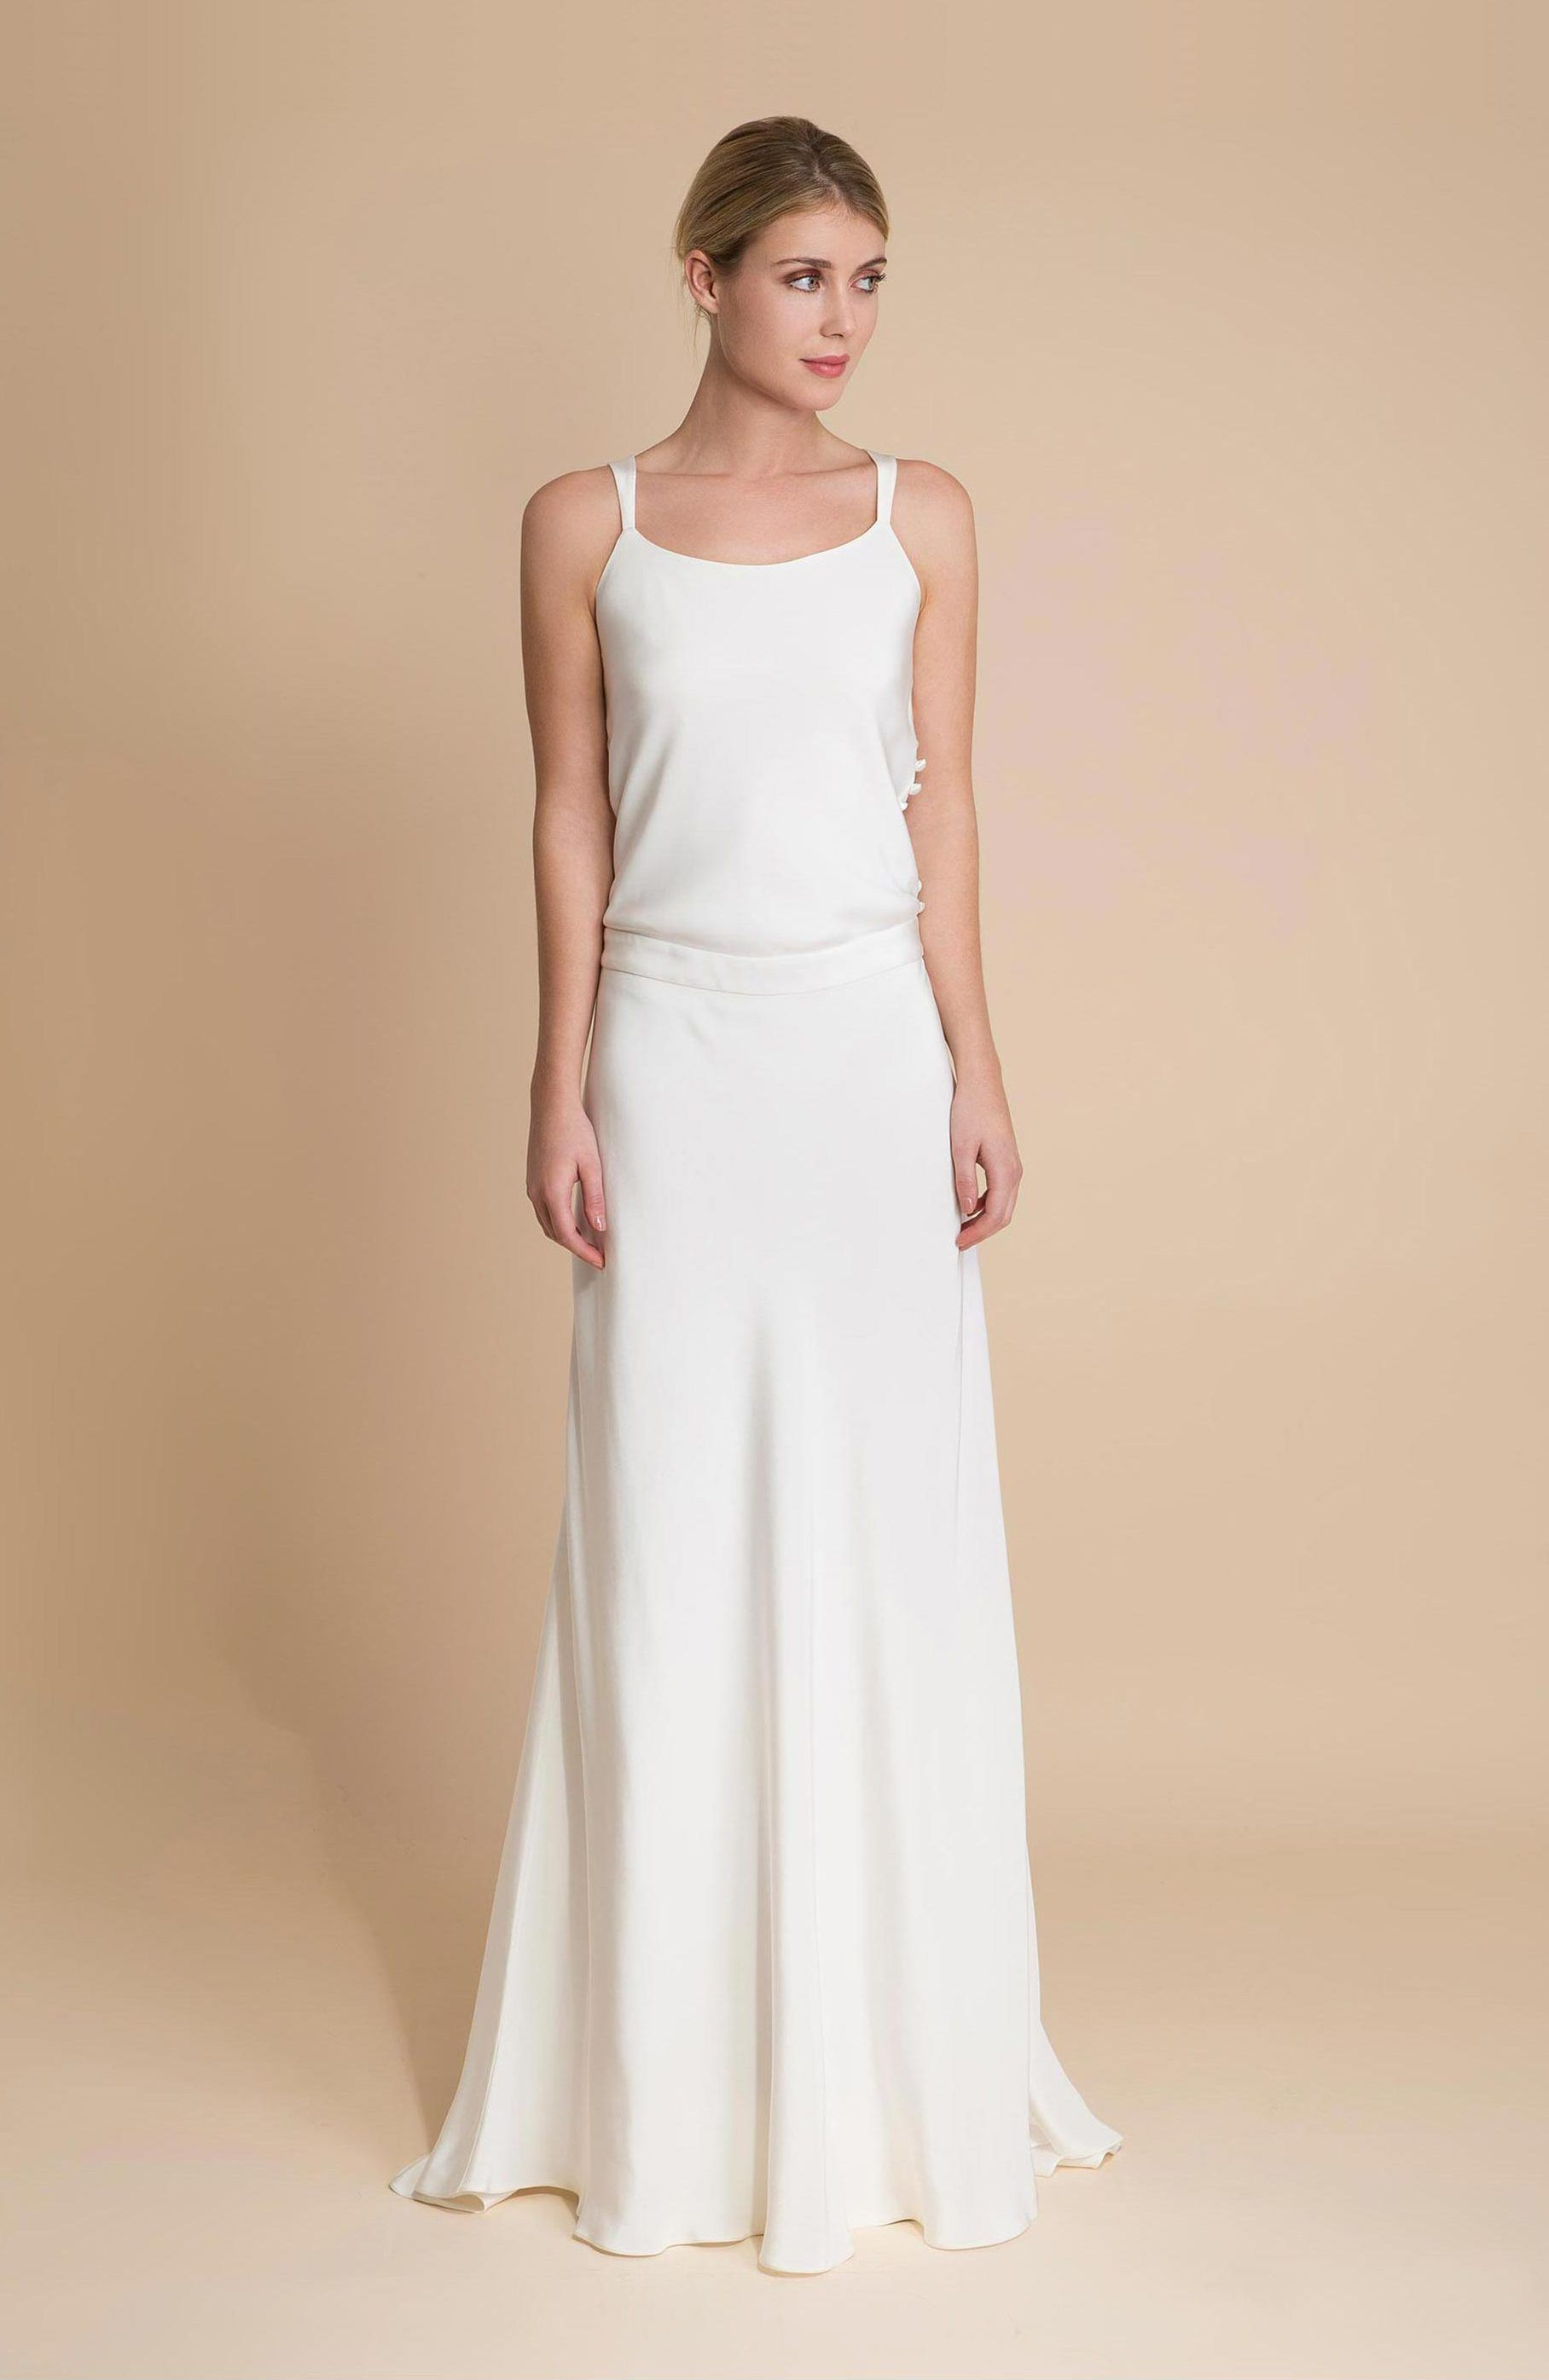 Anatole | Dresses, Bridal dresses, Wedding dresses